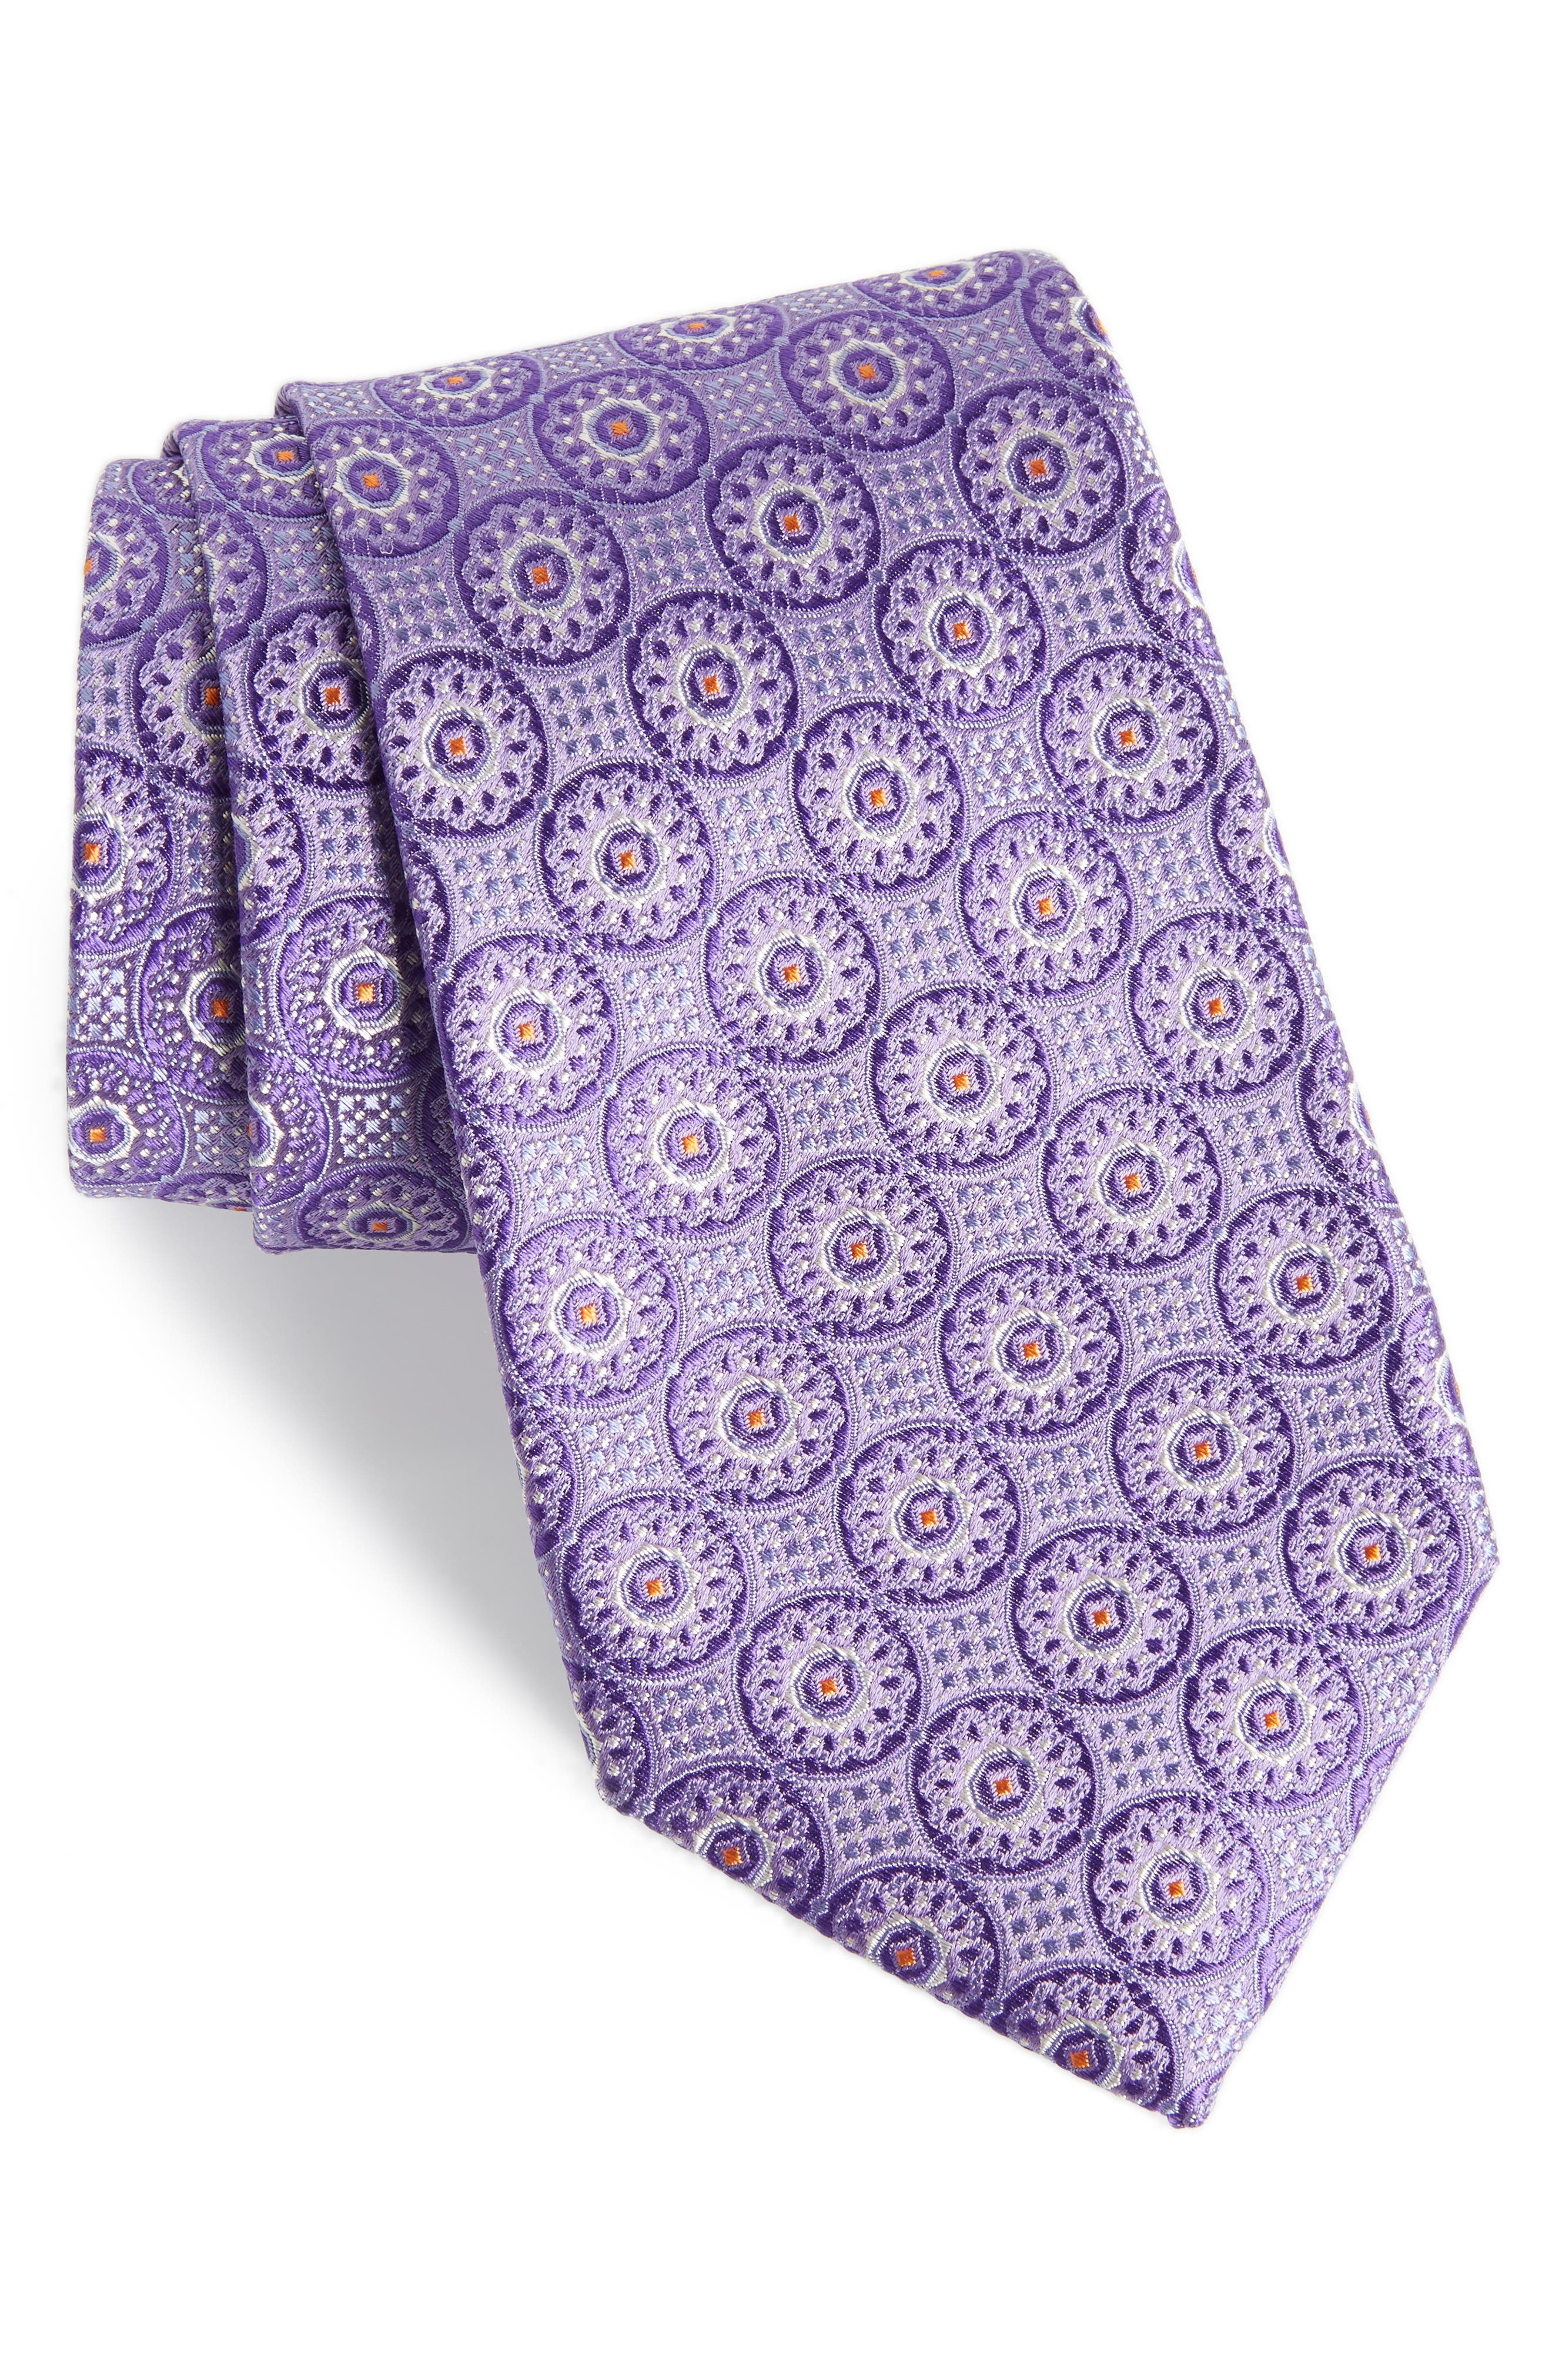 Kaymer Medallion Silk Tie,                             Main thumbnail 1, color,                             Purple